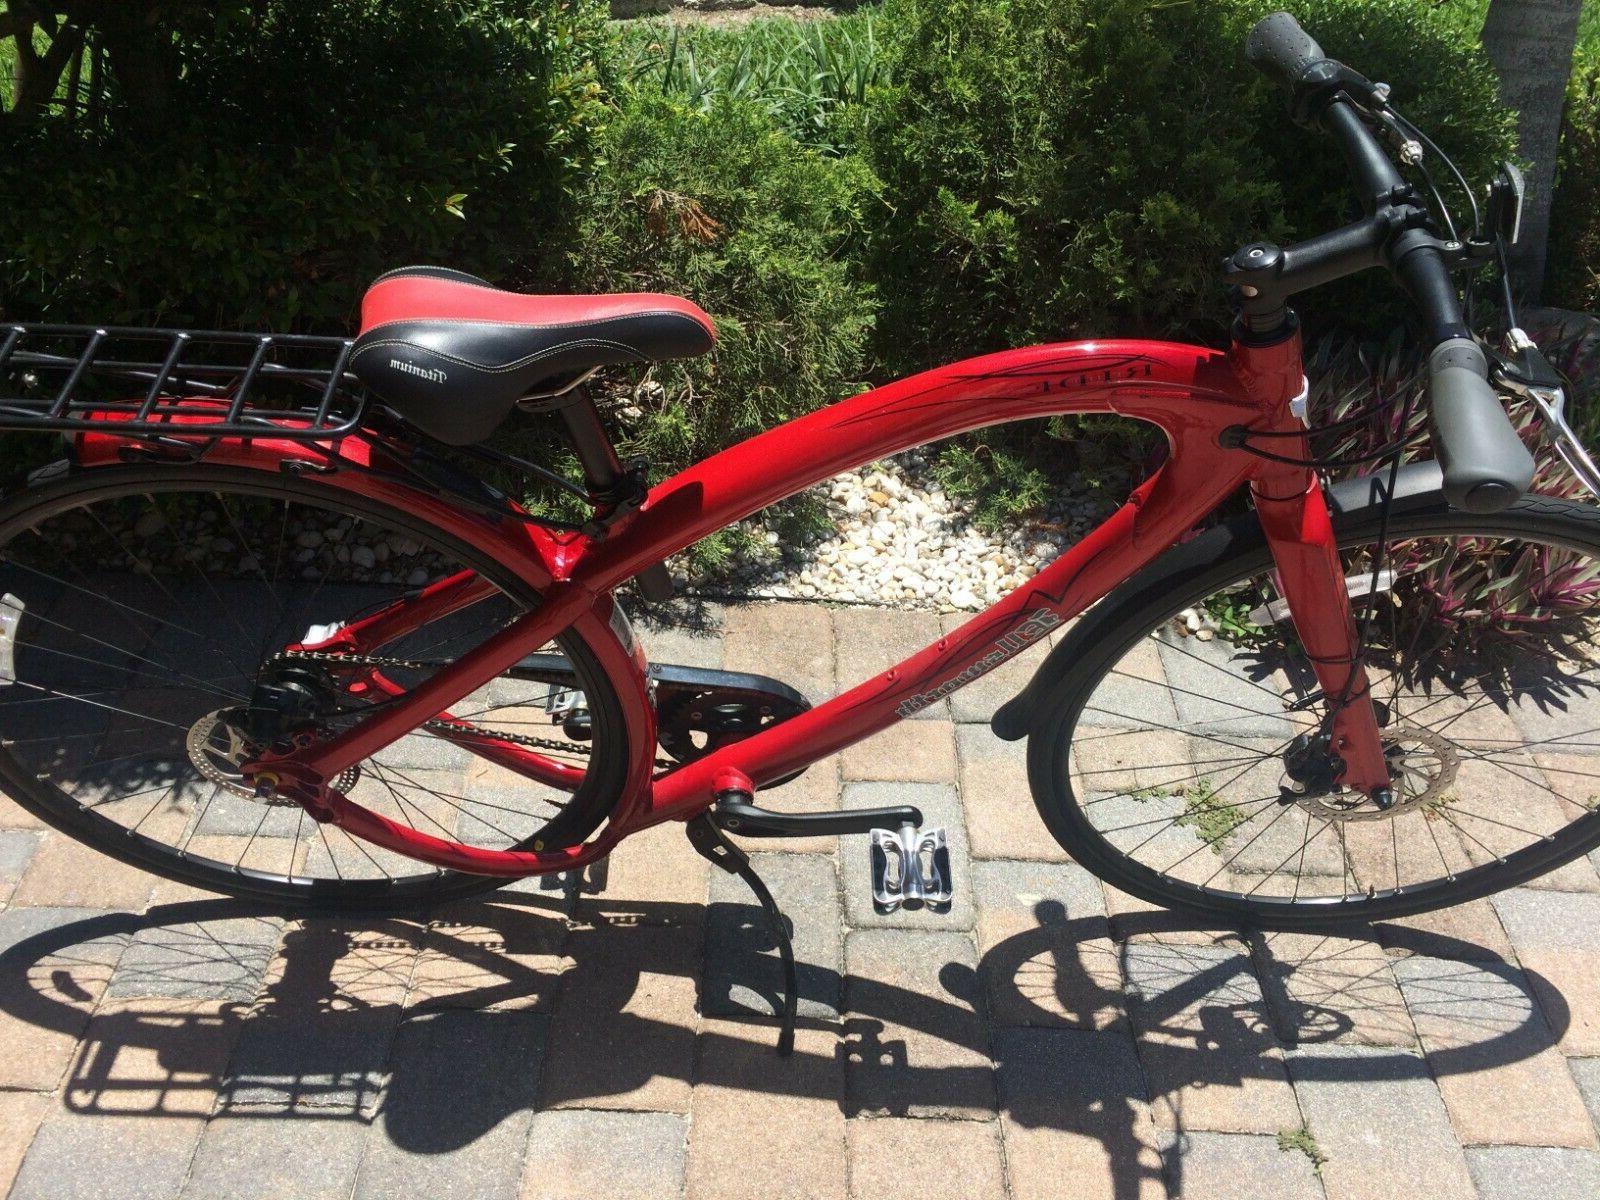 Ellsworth's Red beach bike patented